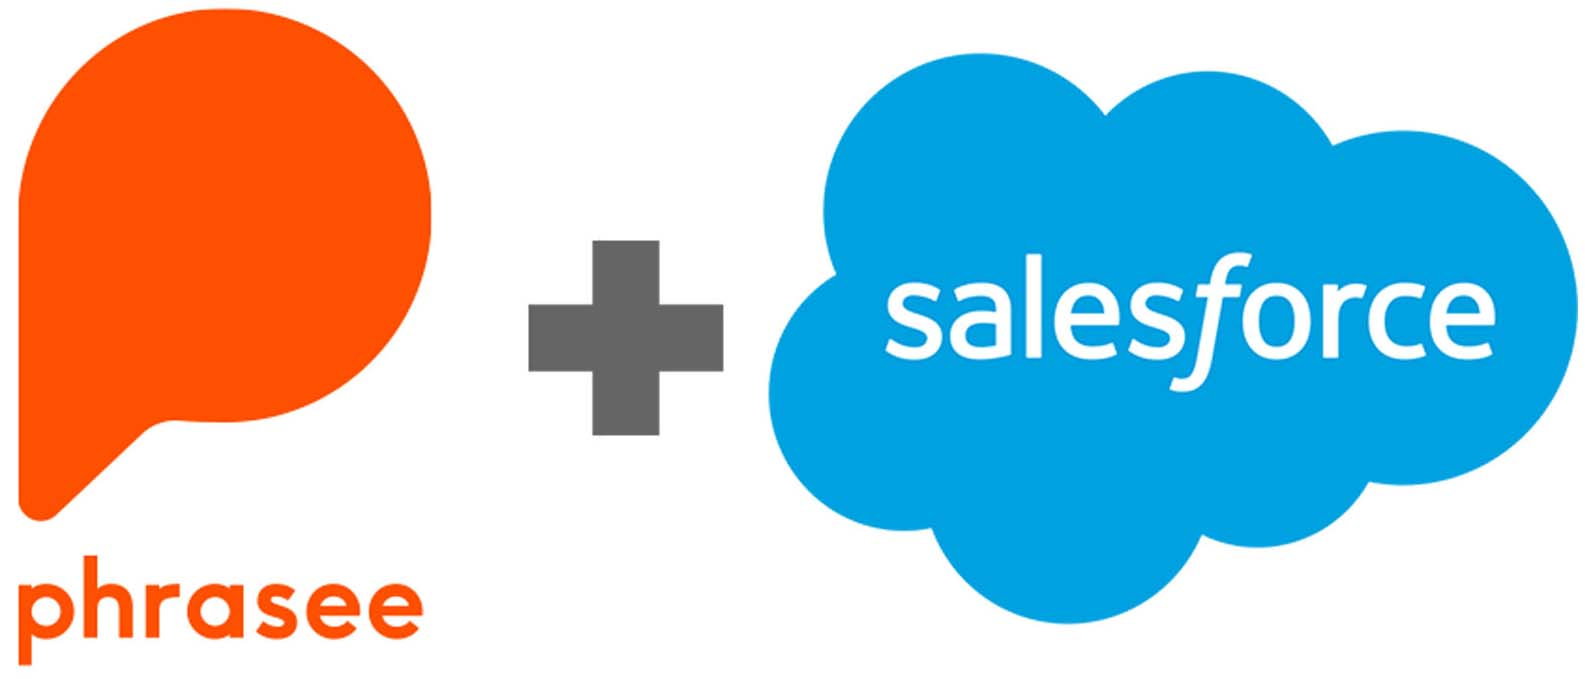 phrasee + salesforce